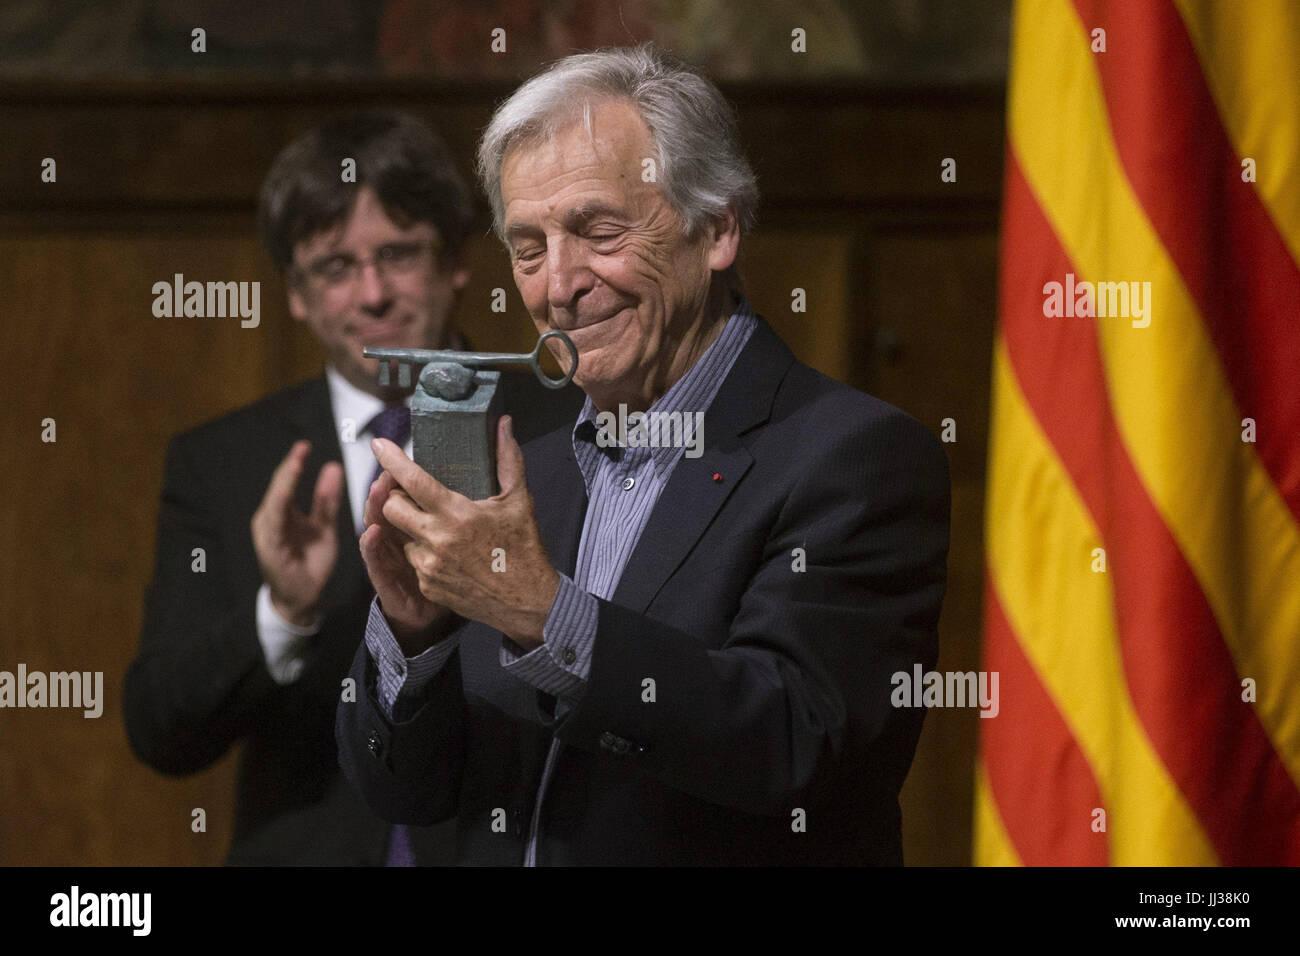 Greek filmaker Konstantinos Costa-Gavras receives the XXIX International Award of Catalonia during a handover ceremony - Stock Image